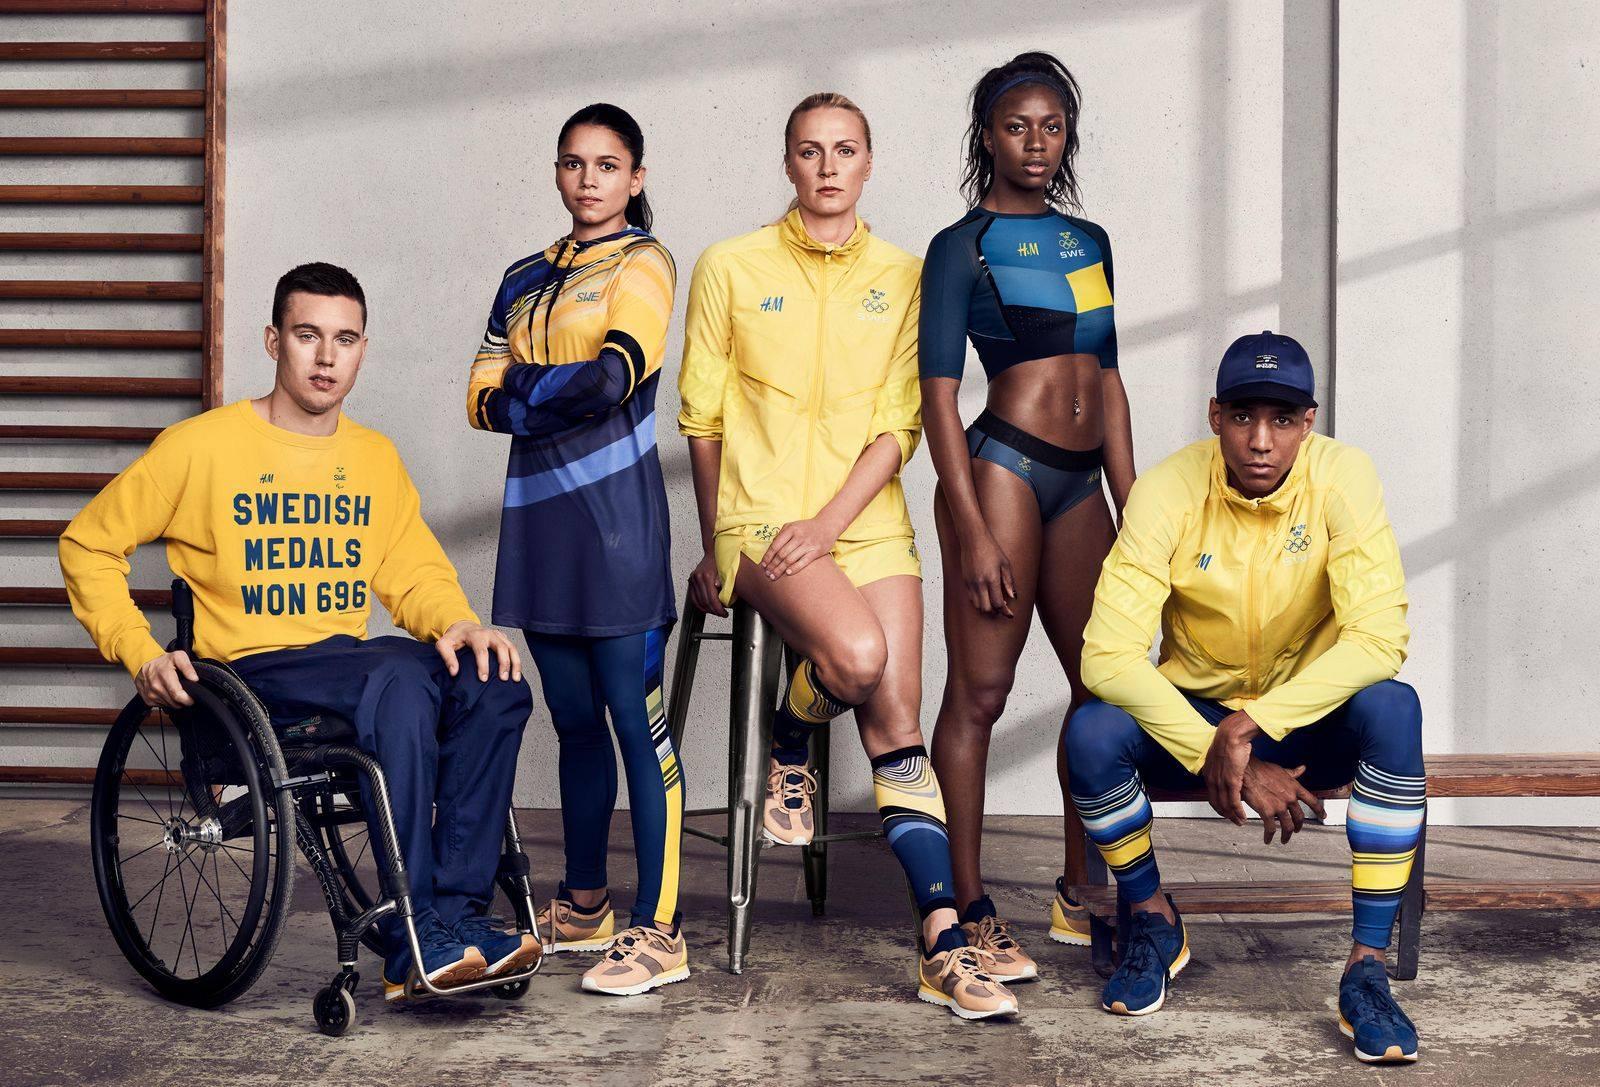 Team Sweden 1